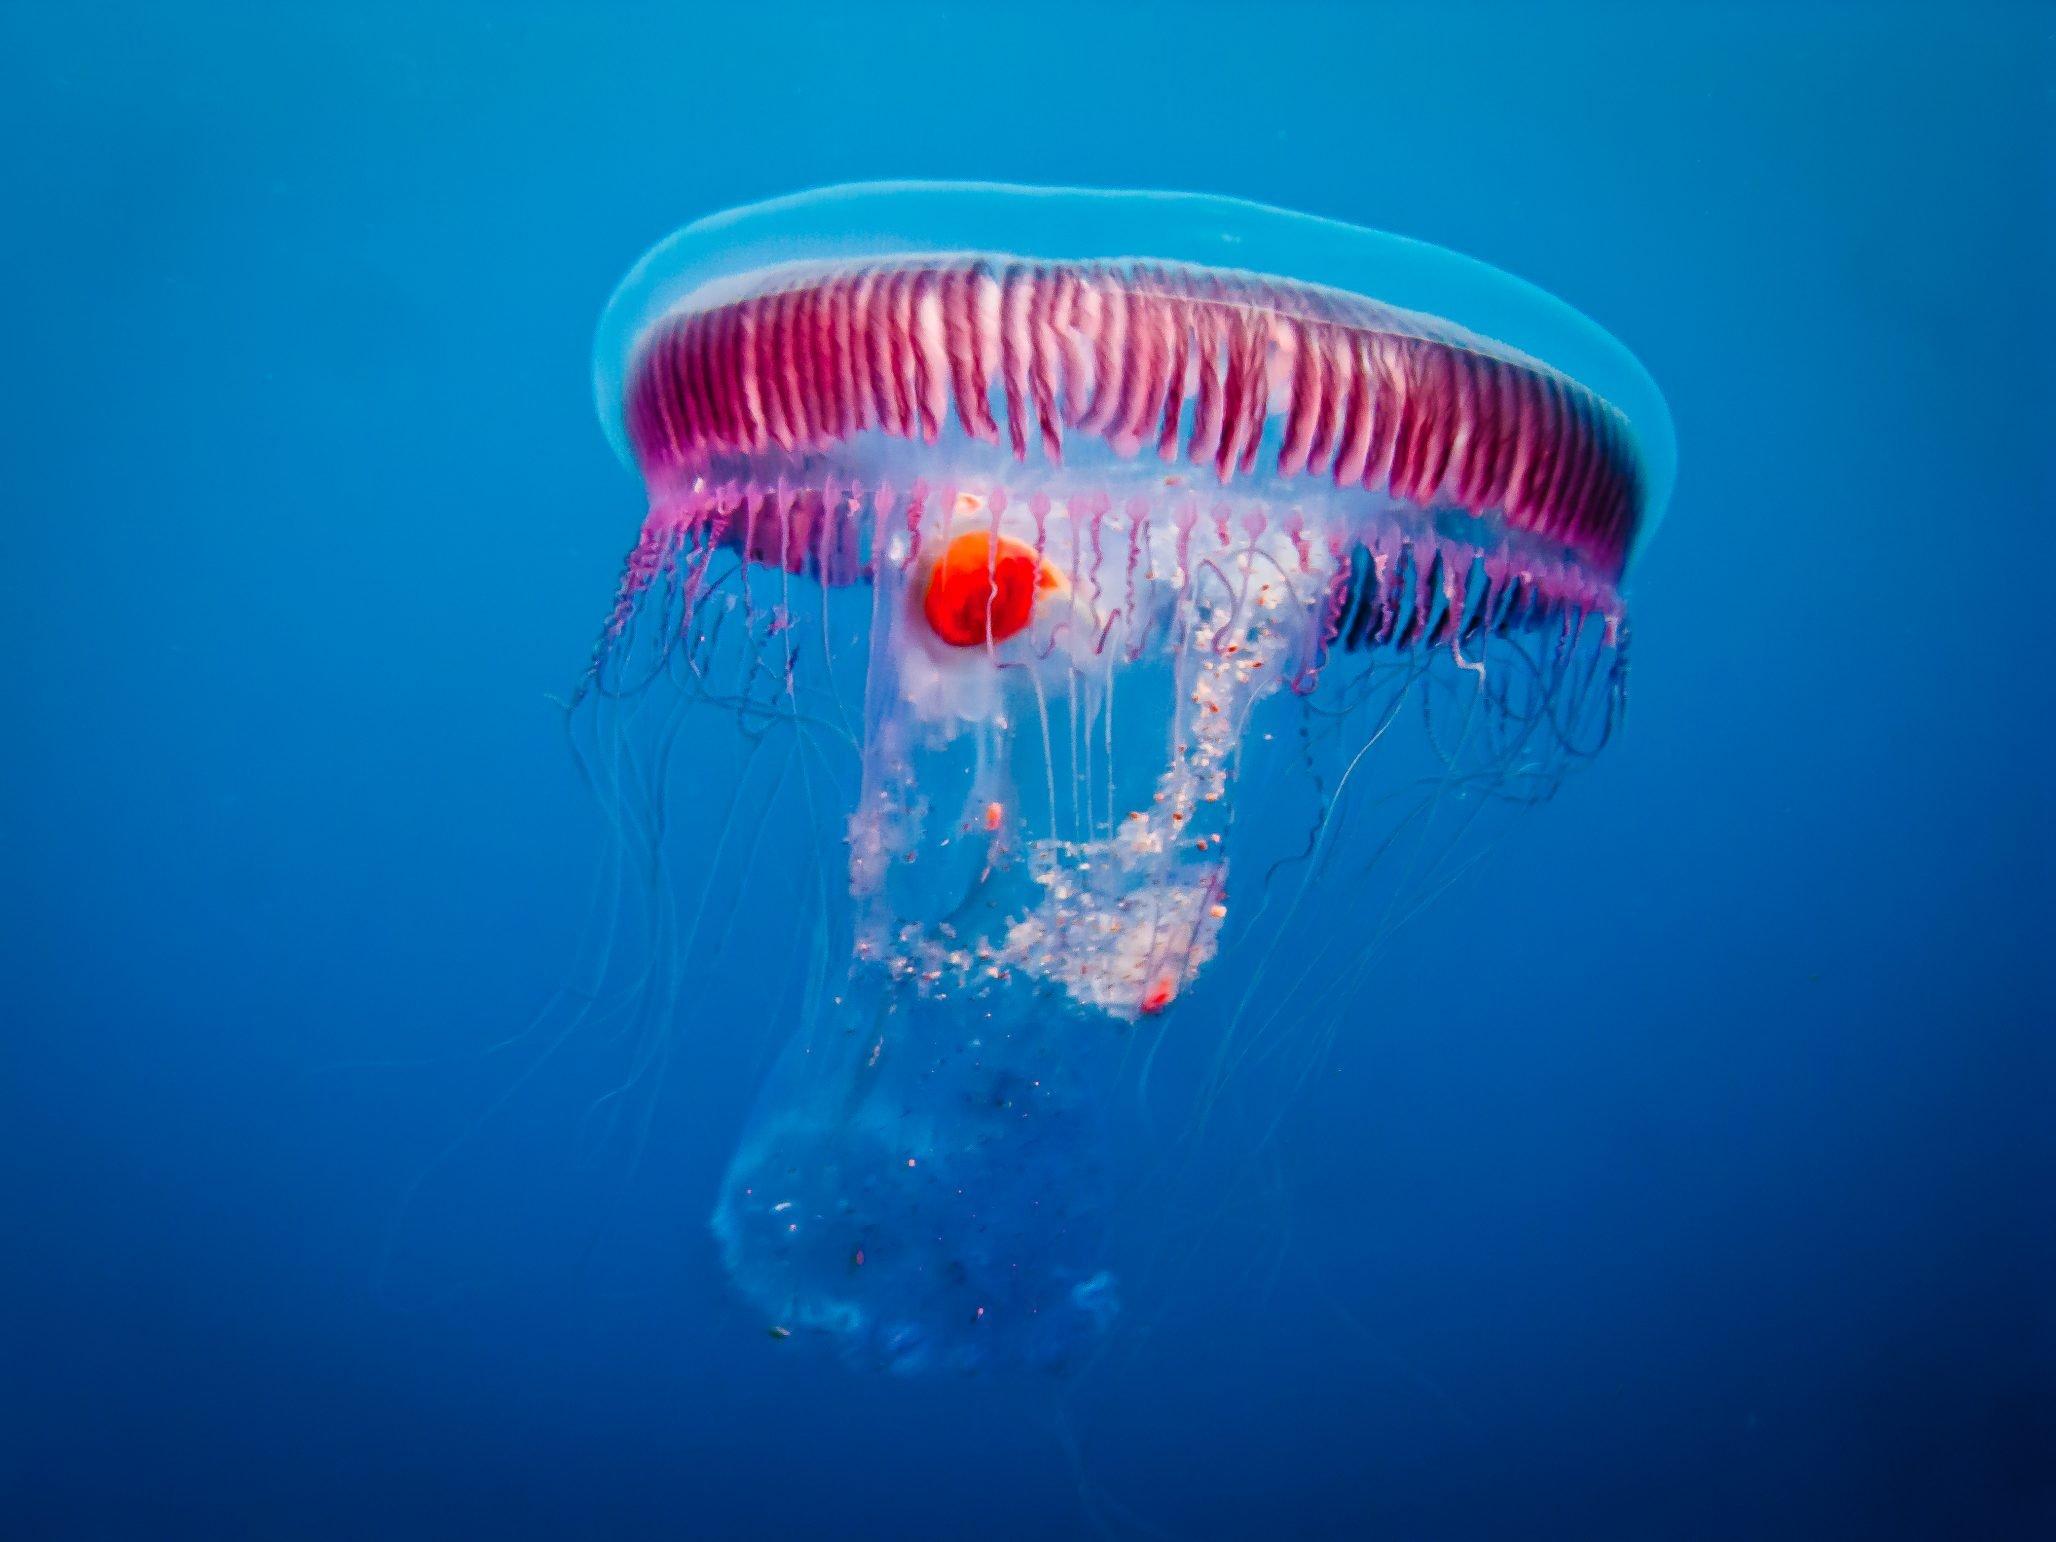 Jellyfish off Reqqa Point gozo